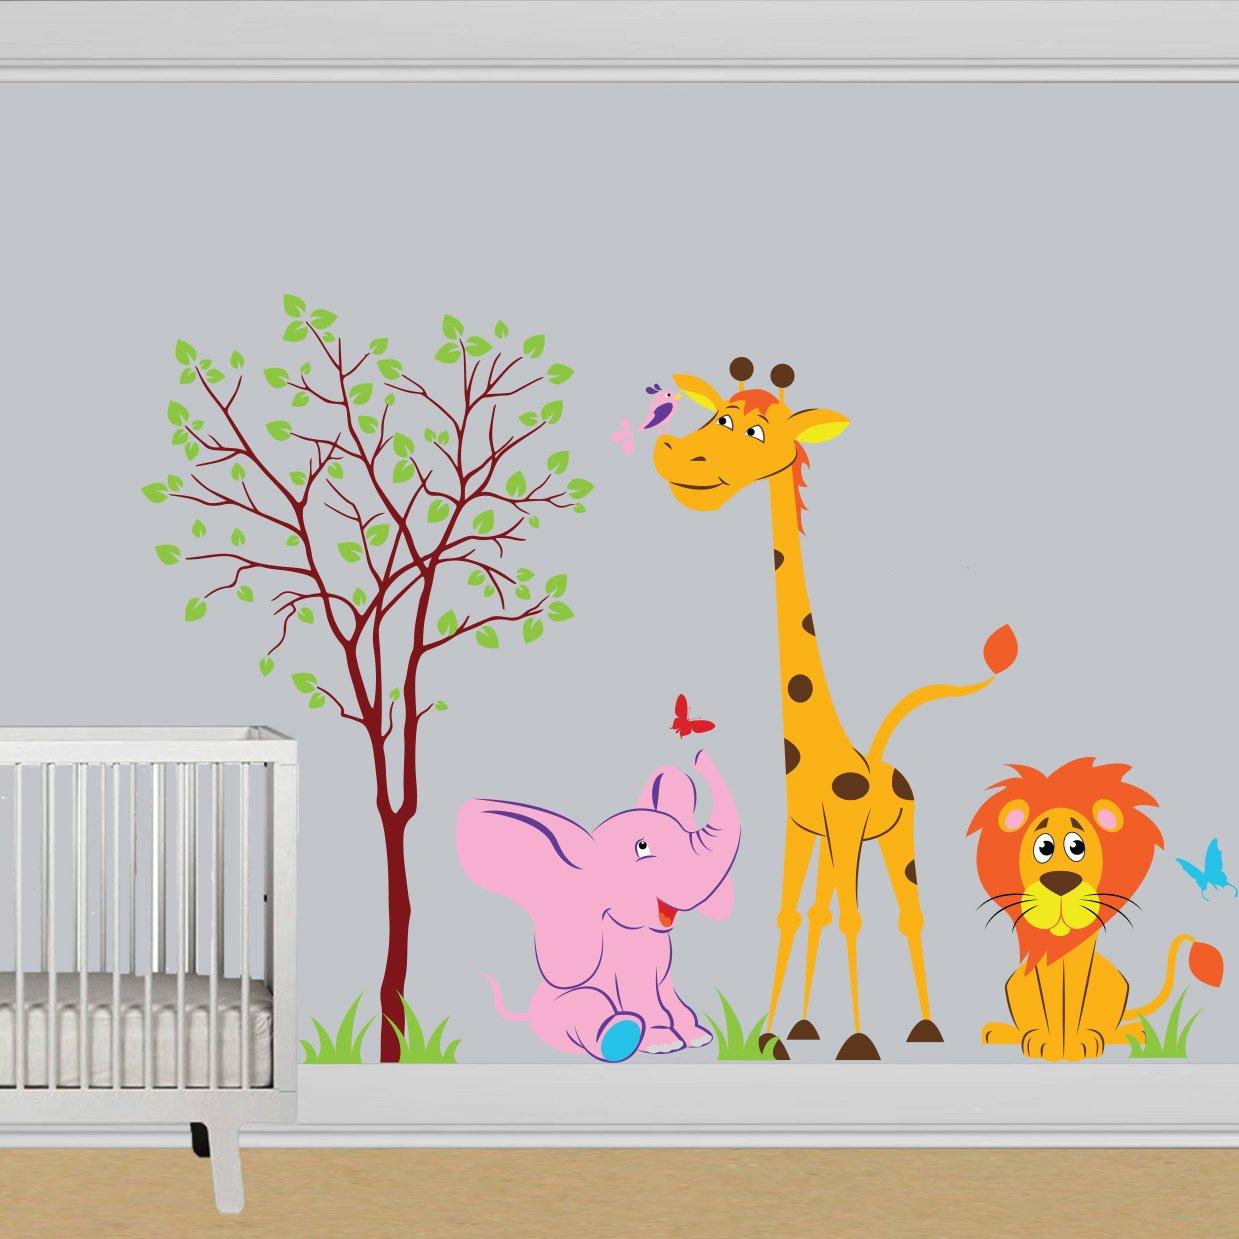 Vinilo de pared (200 x 140 cm) diseño de animales en un bosque ...